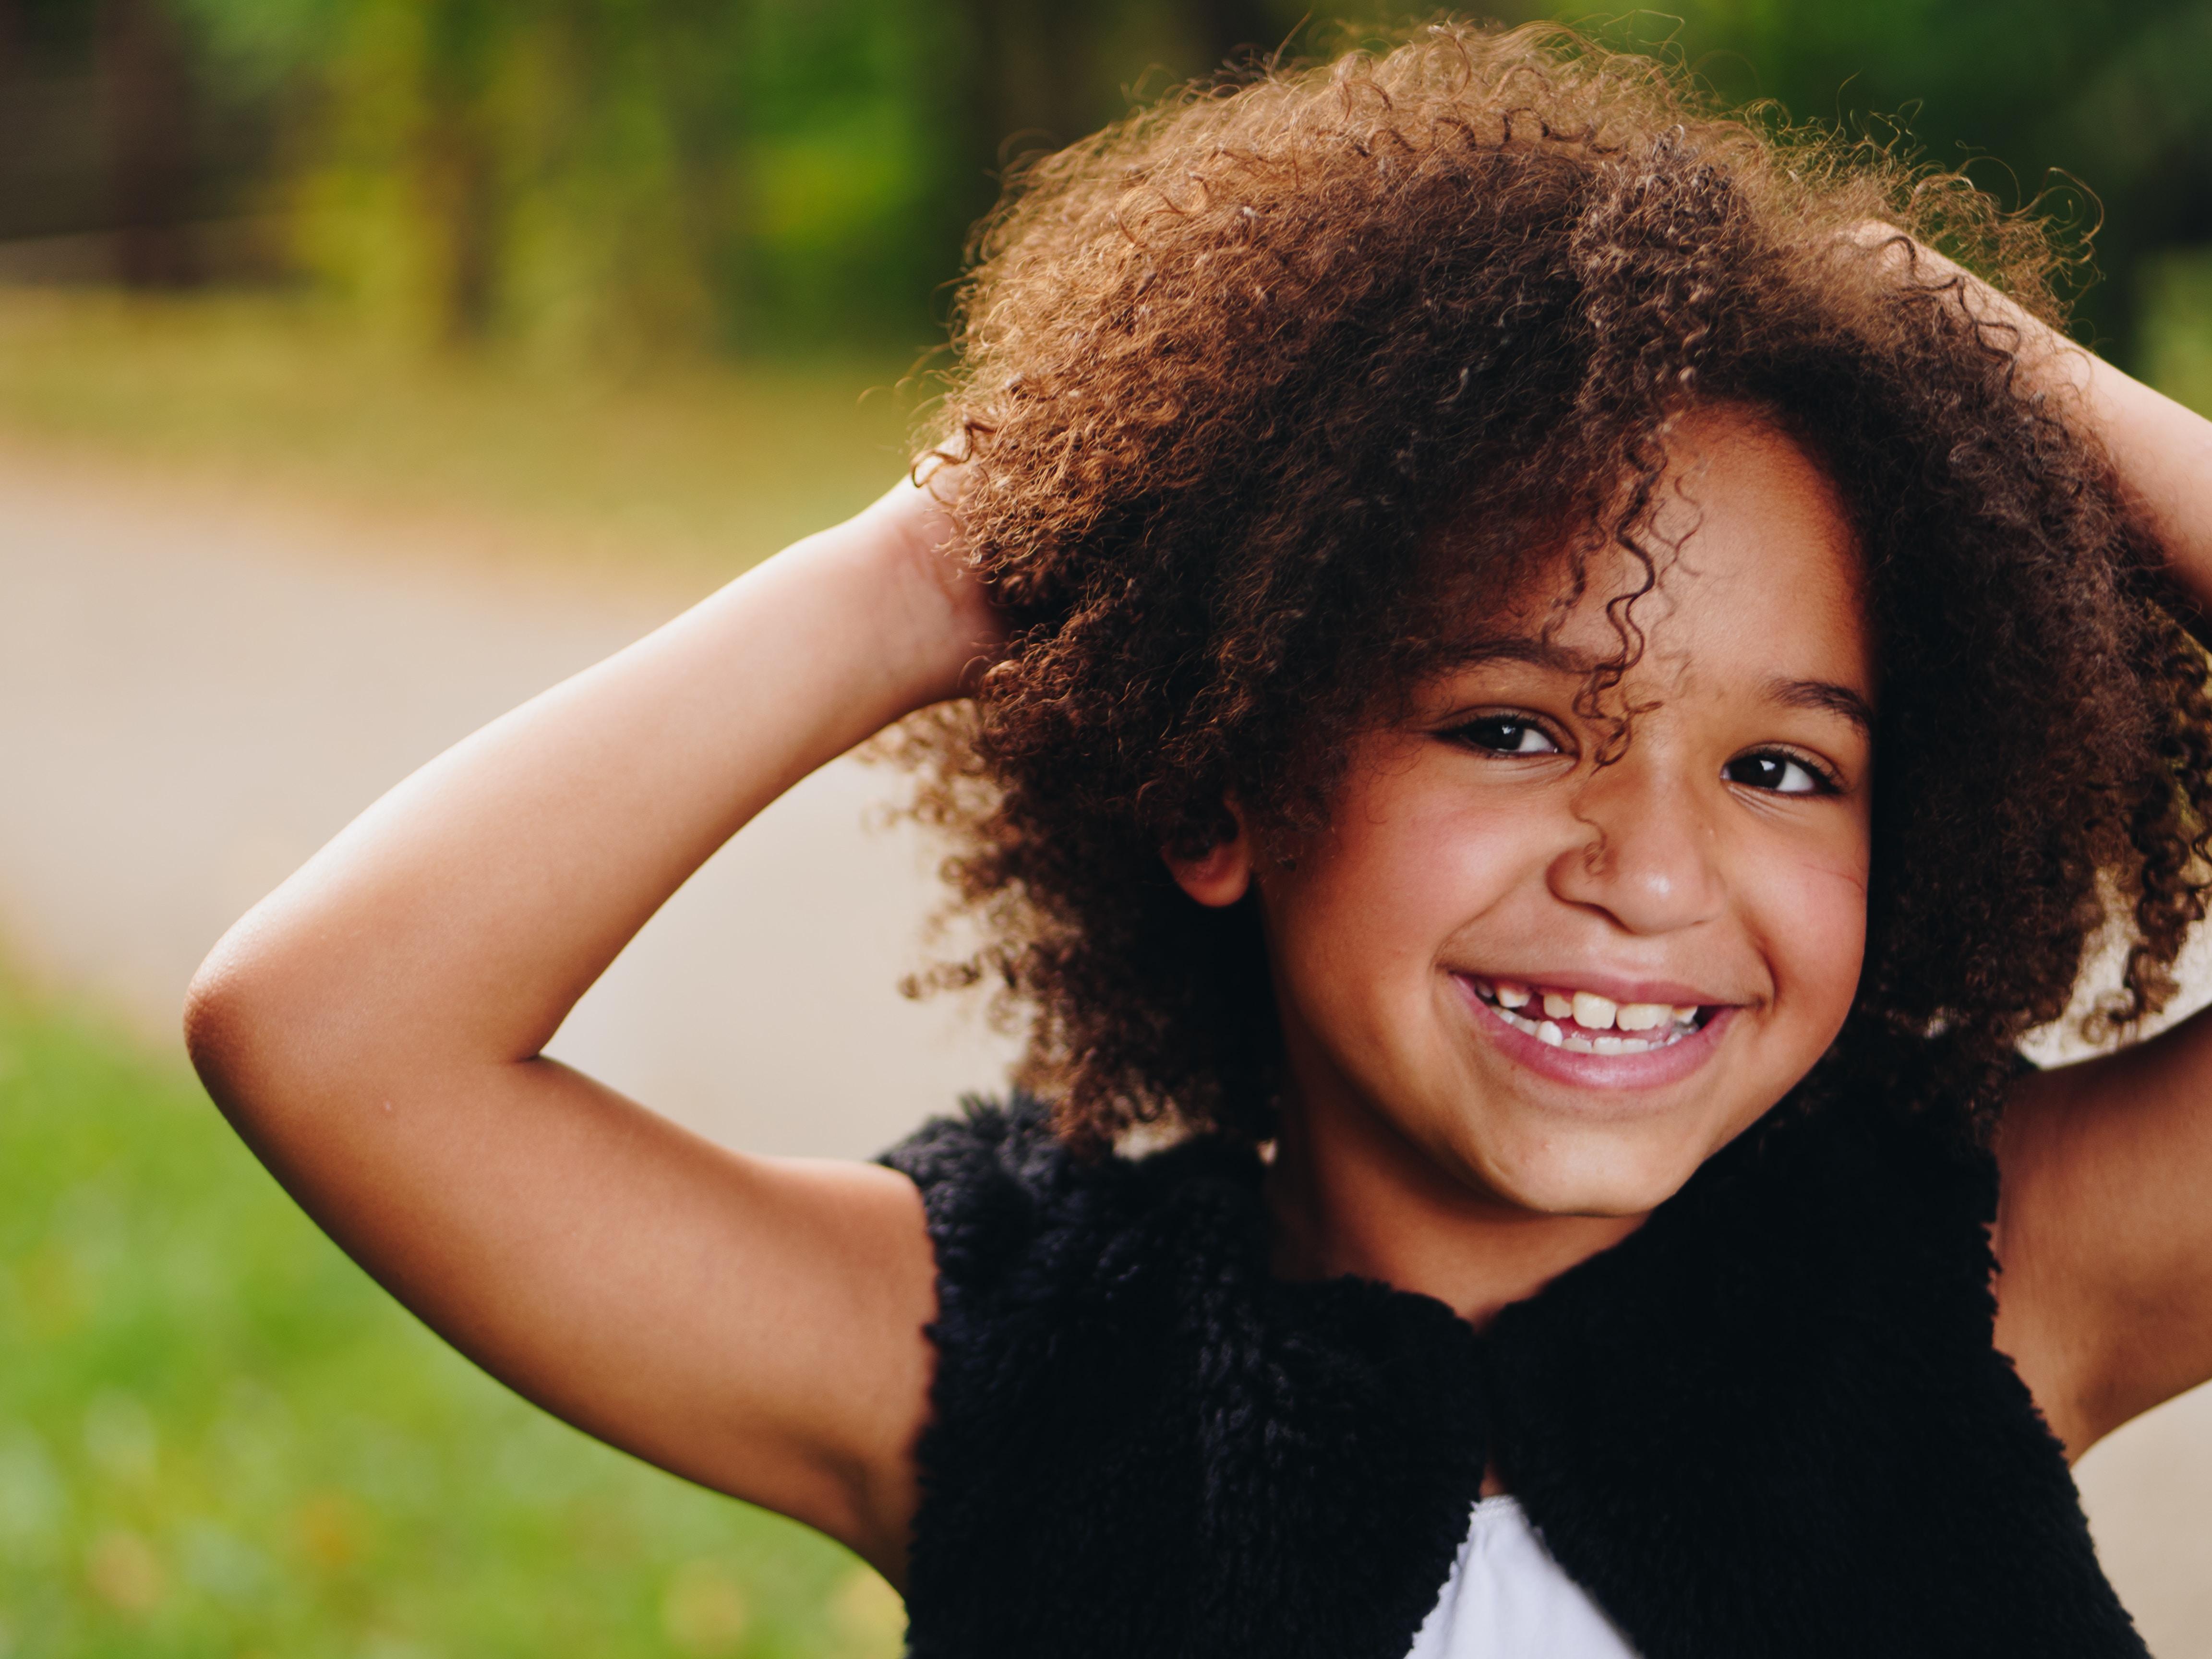 girl smiling 2